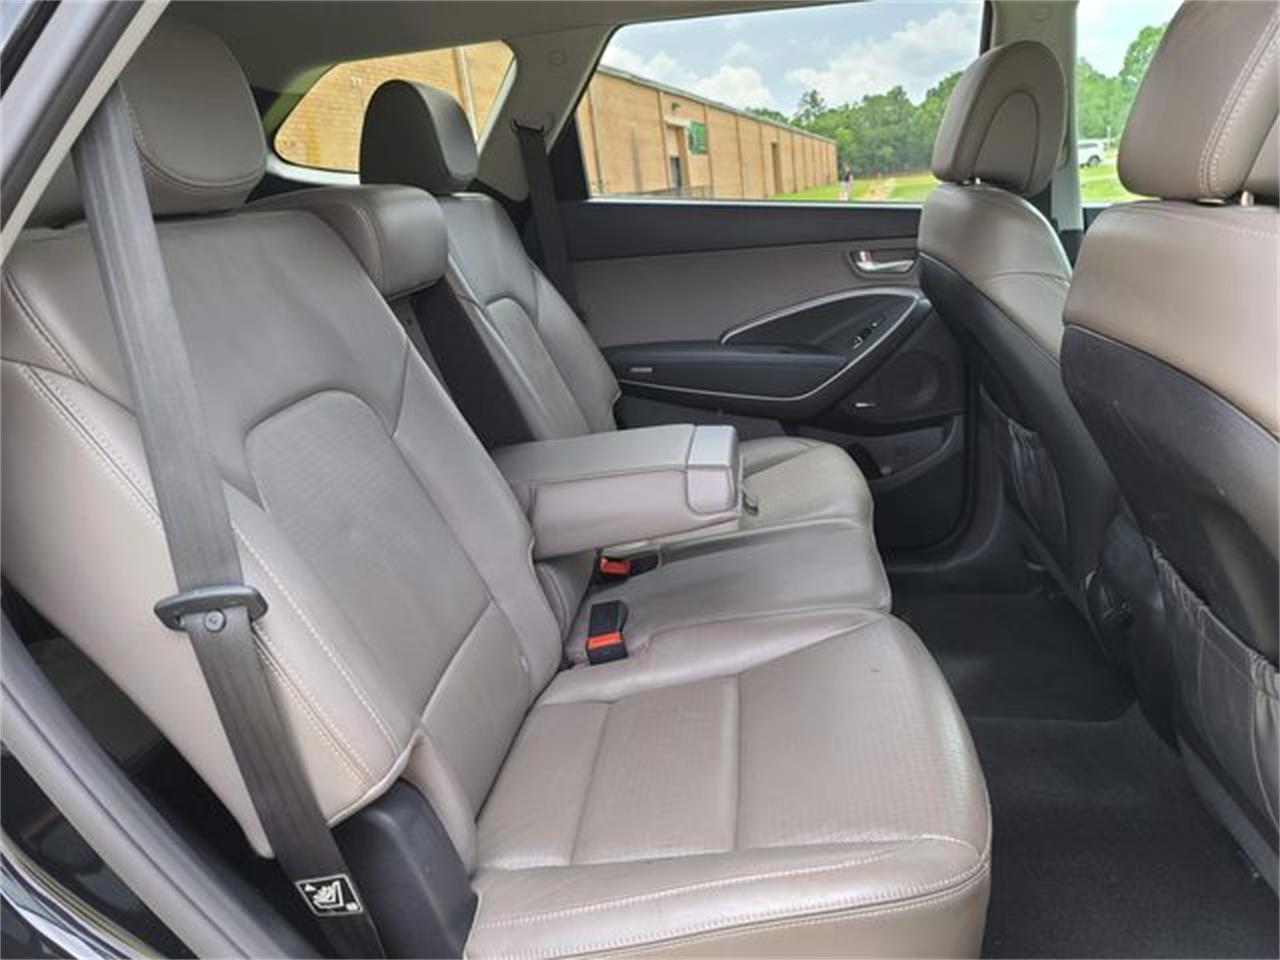 2013 Hyundai Santa Fe (CC-1413479) for sale in Hope Mills, North Carolina